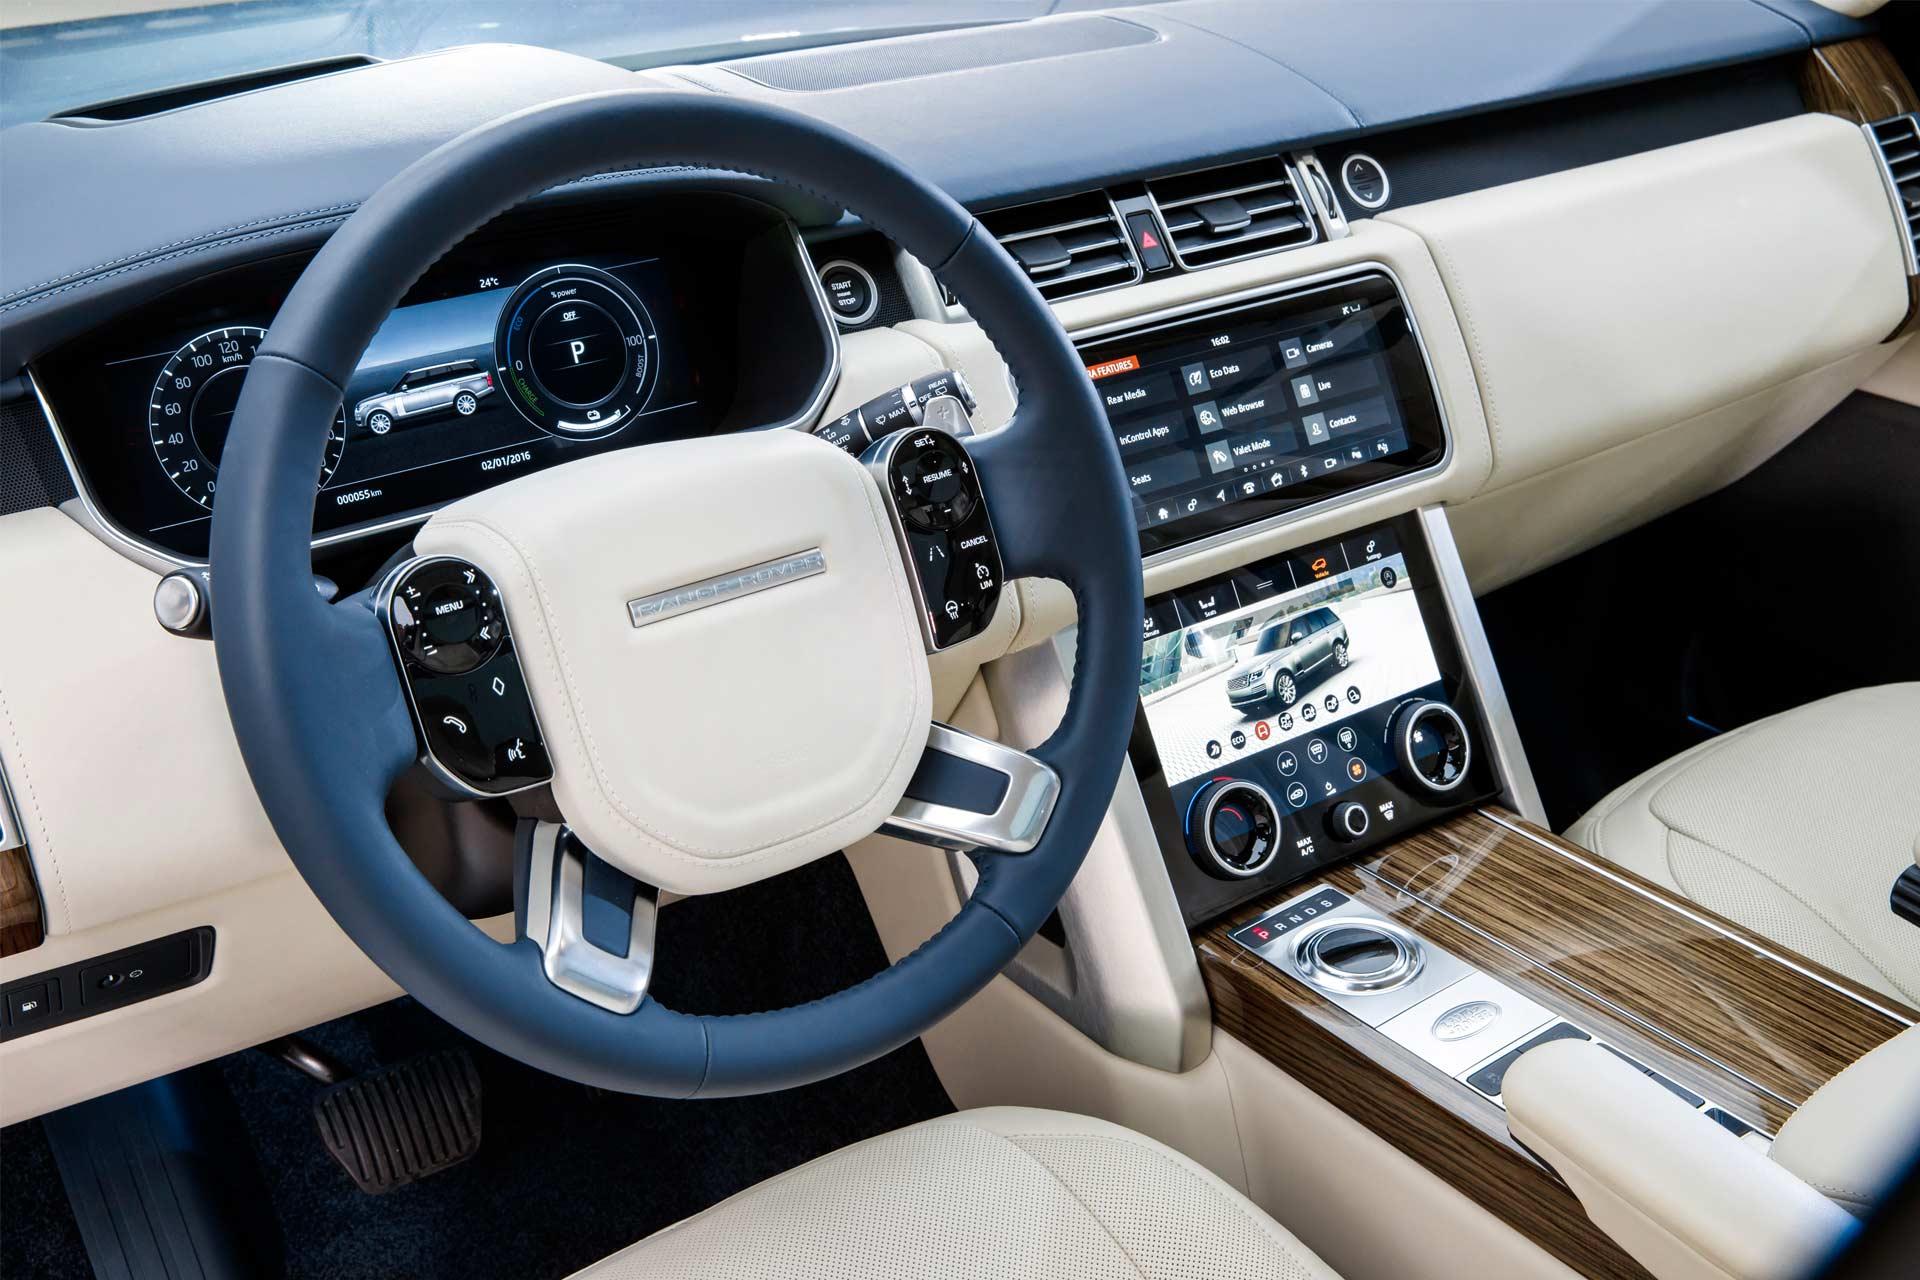 2018-Range-Rover-interior_2